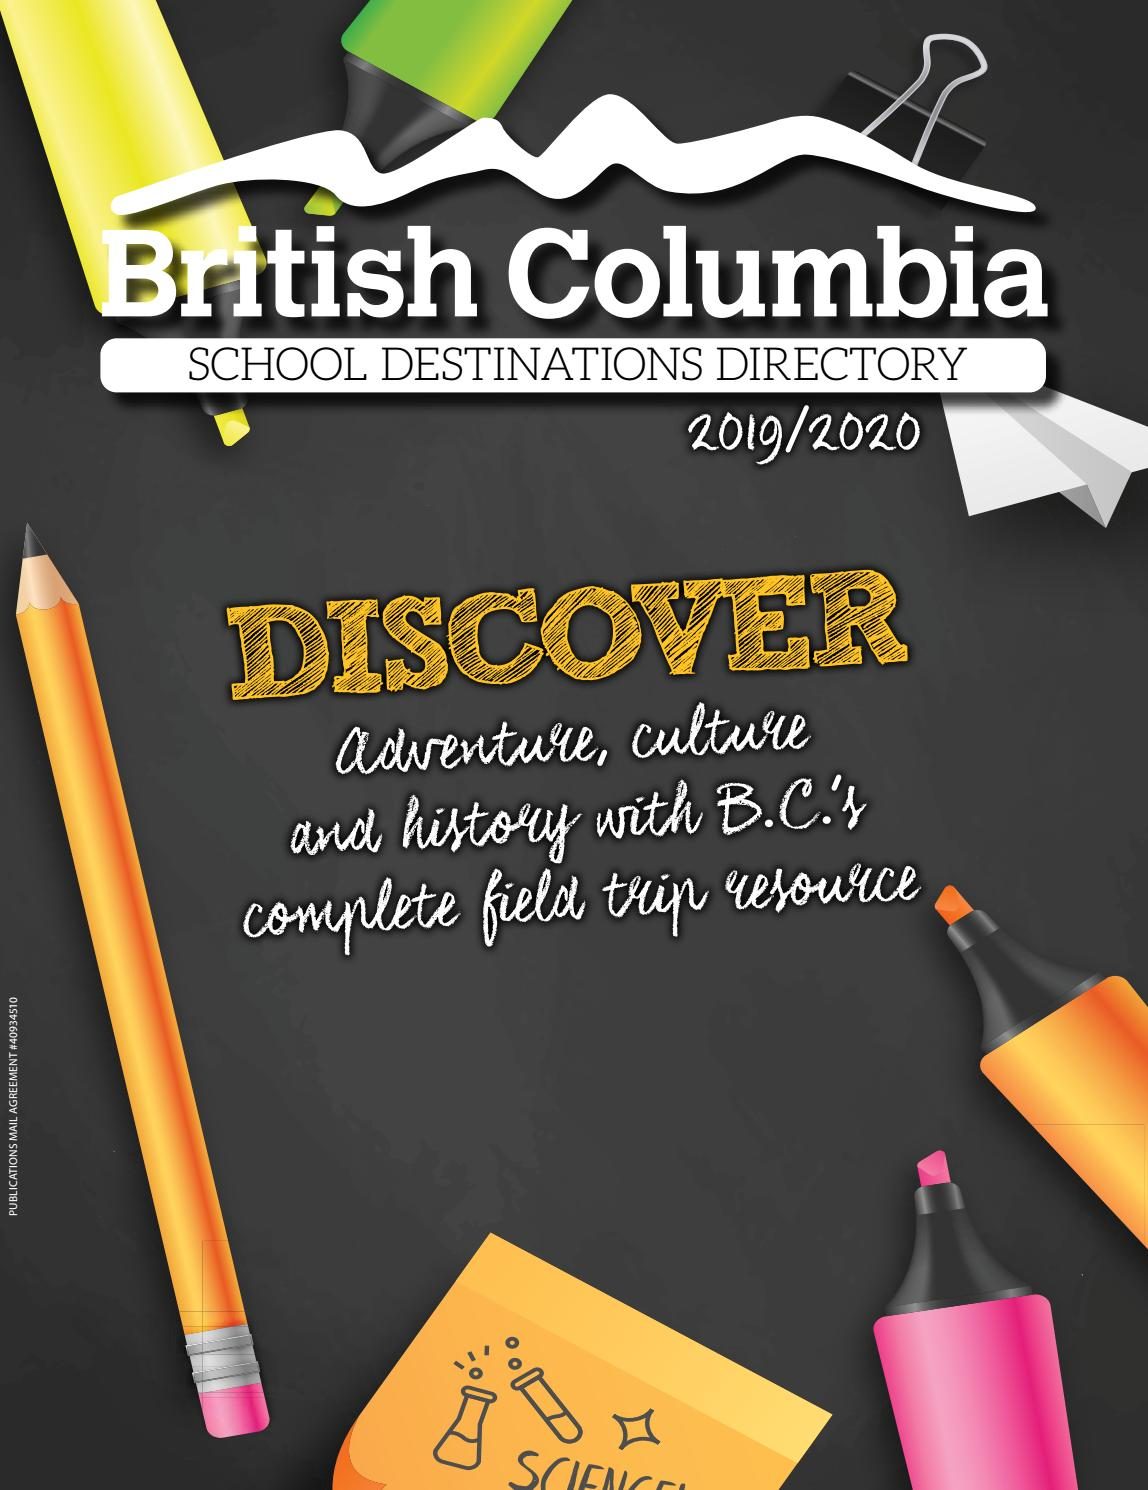 819 432 3737 >> British Columbia School Destinations Directory 2019 2020 By